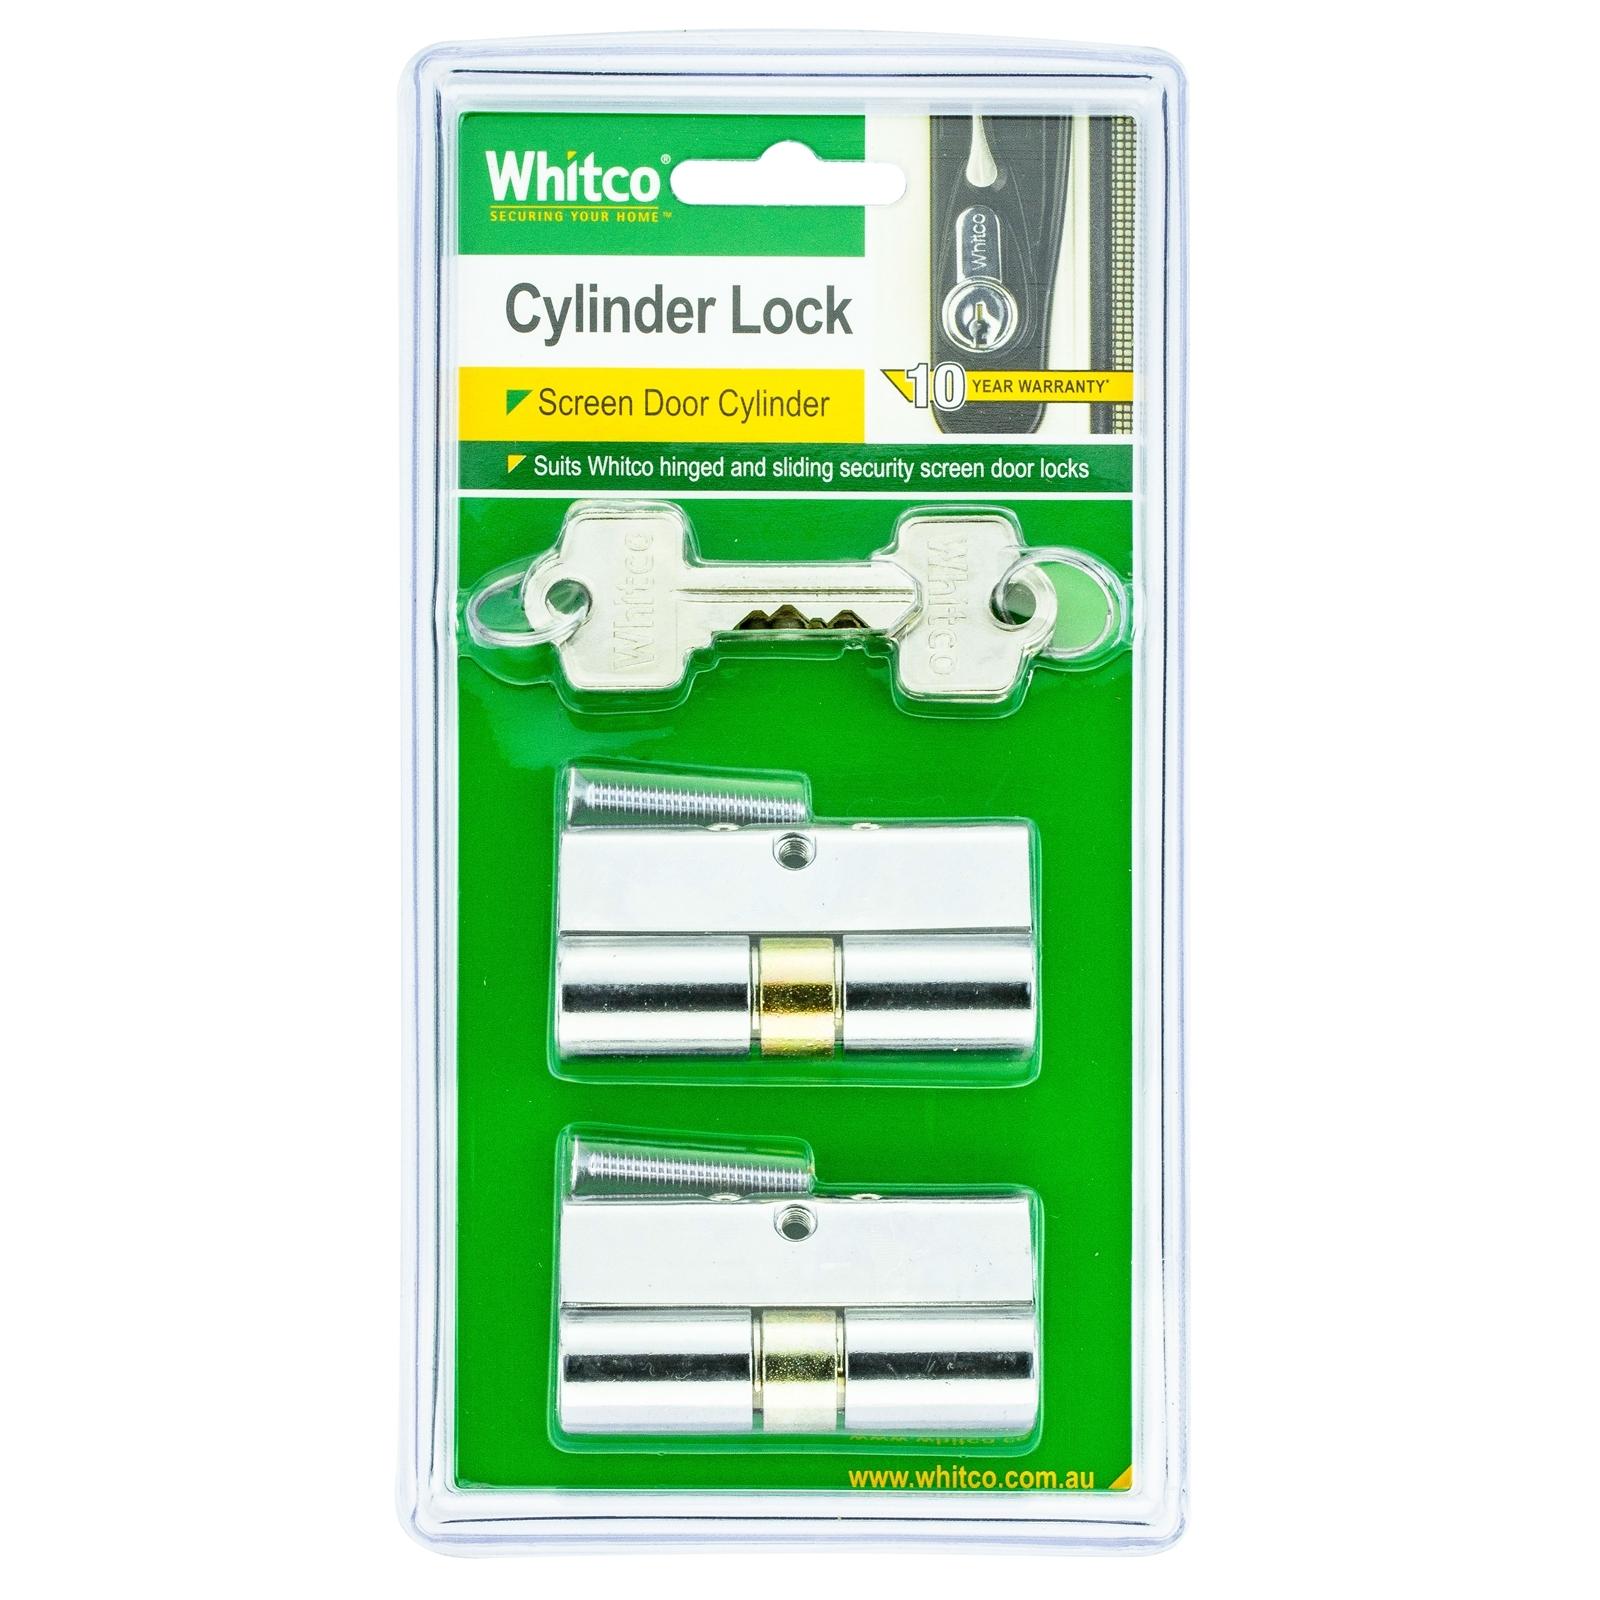 Whitco 5 Pin Keyed Alike Cylinder Lock - 2 Pack